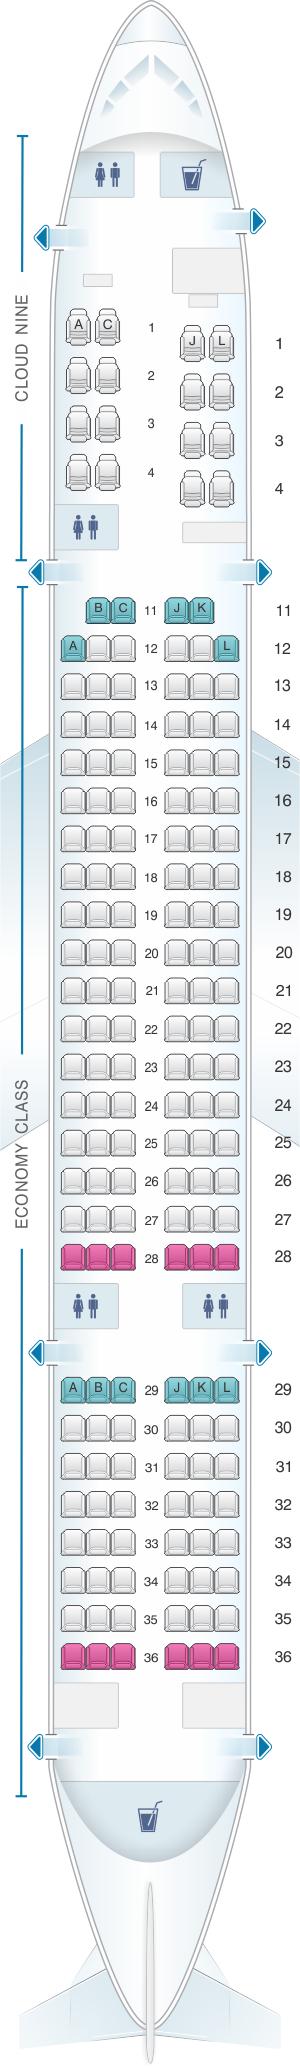 Seat map for Ethiopian Boeing B757 200 ER 170pax